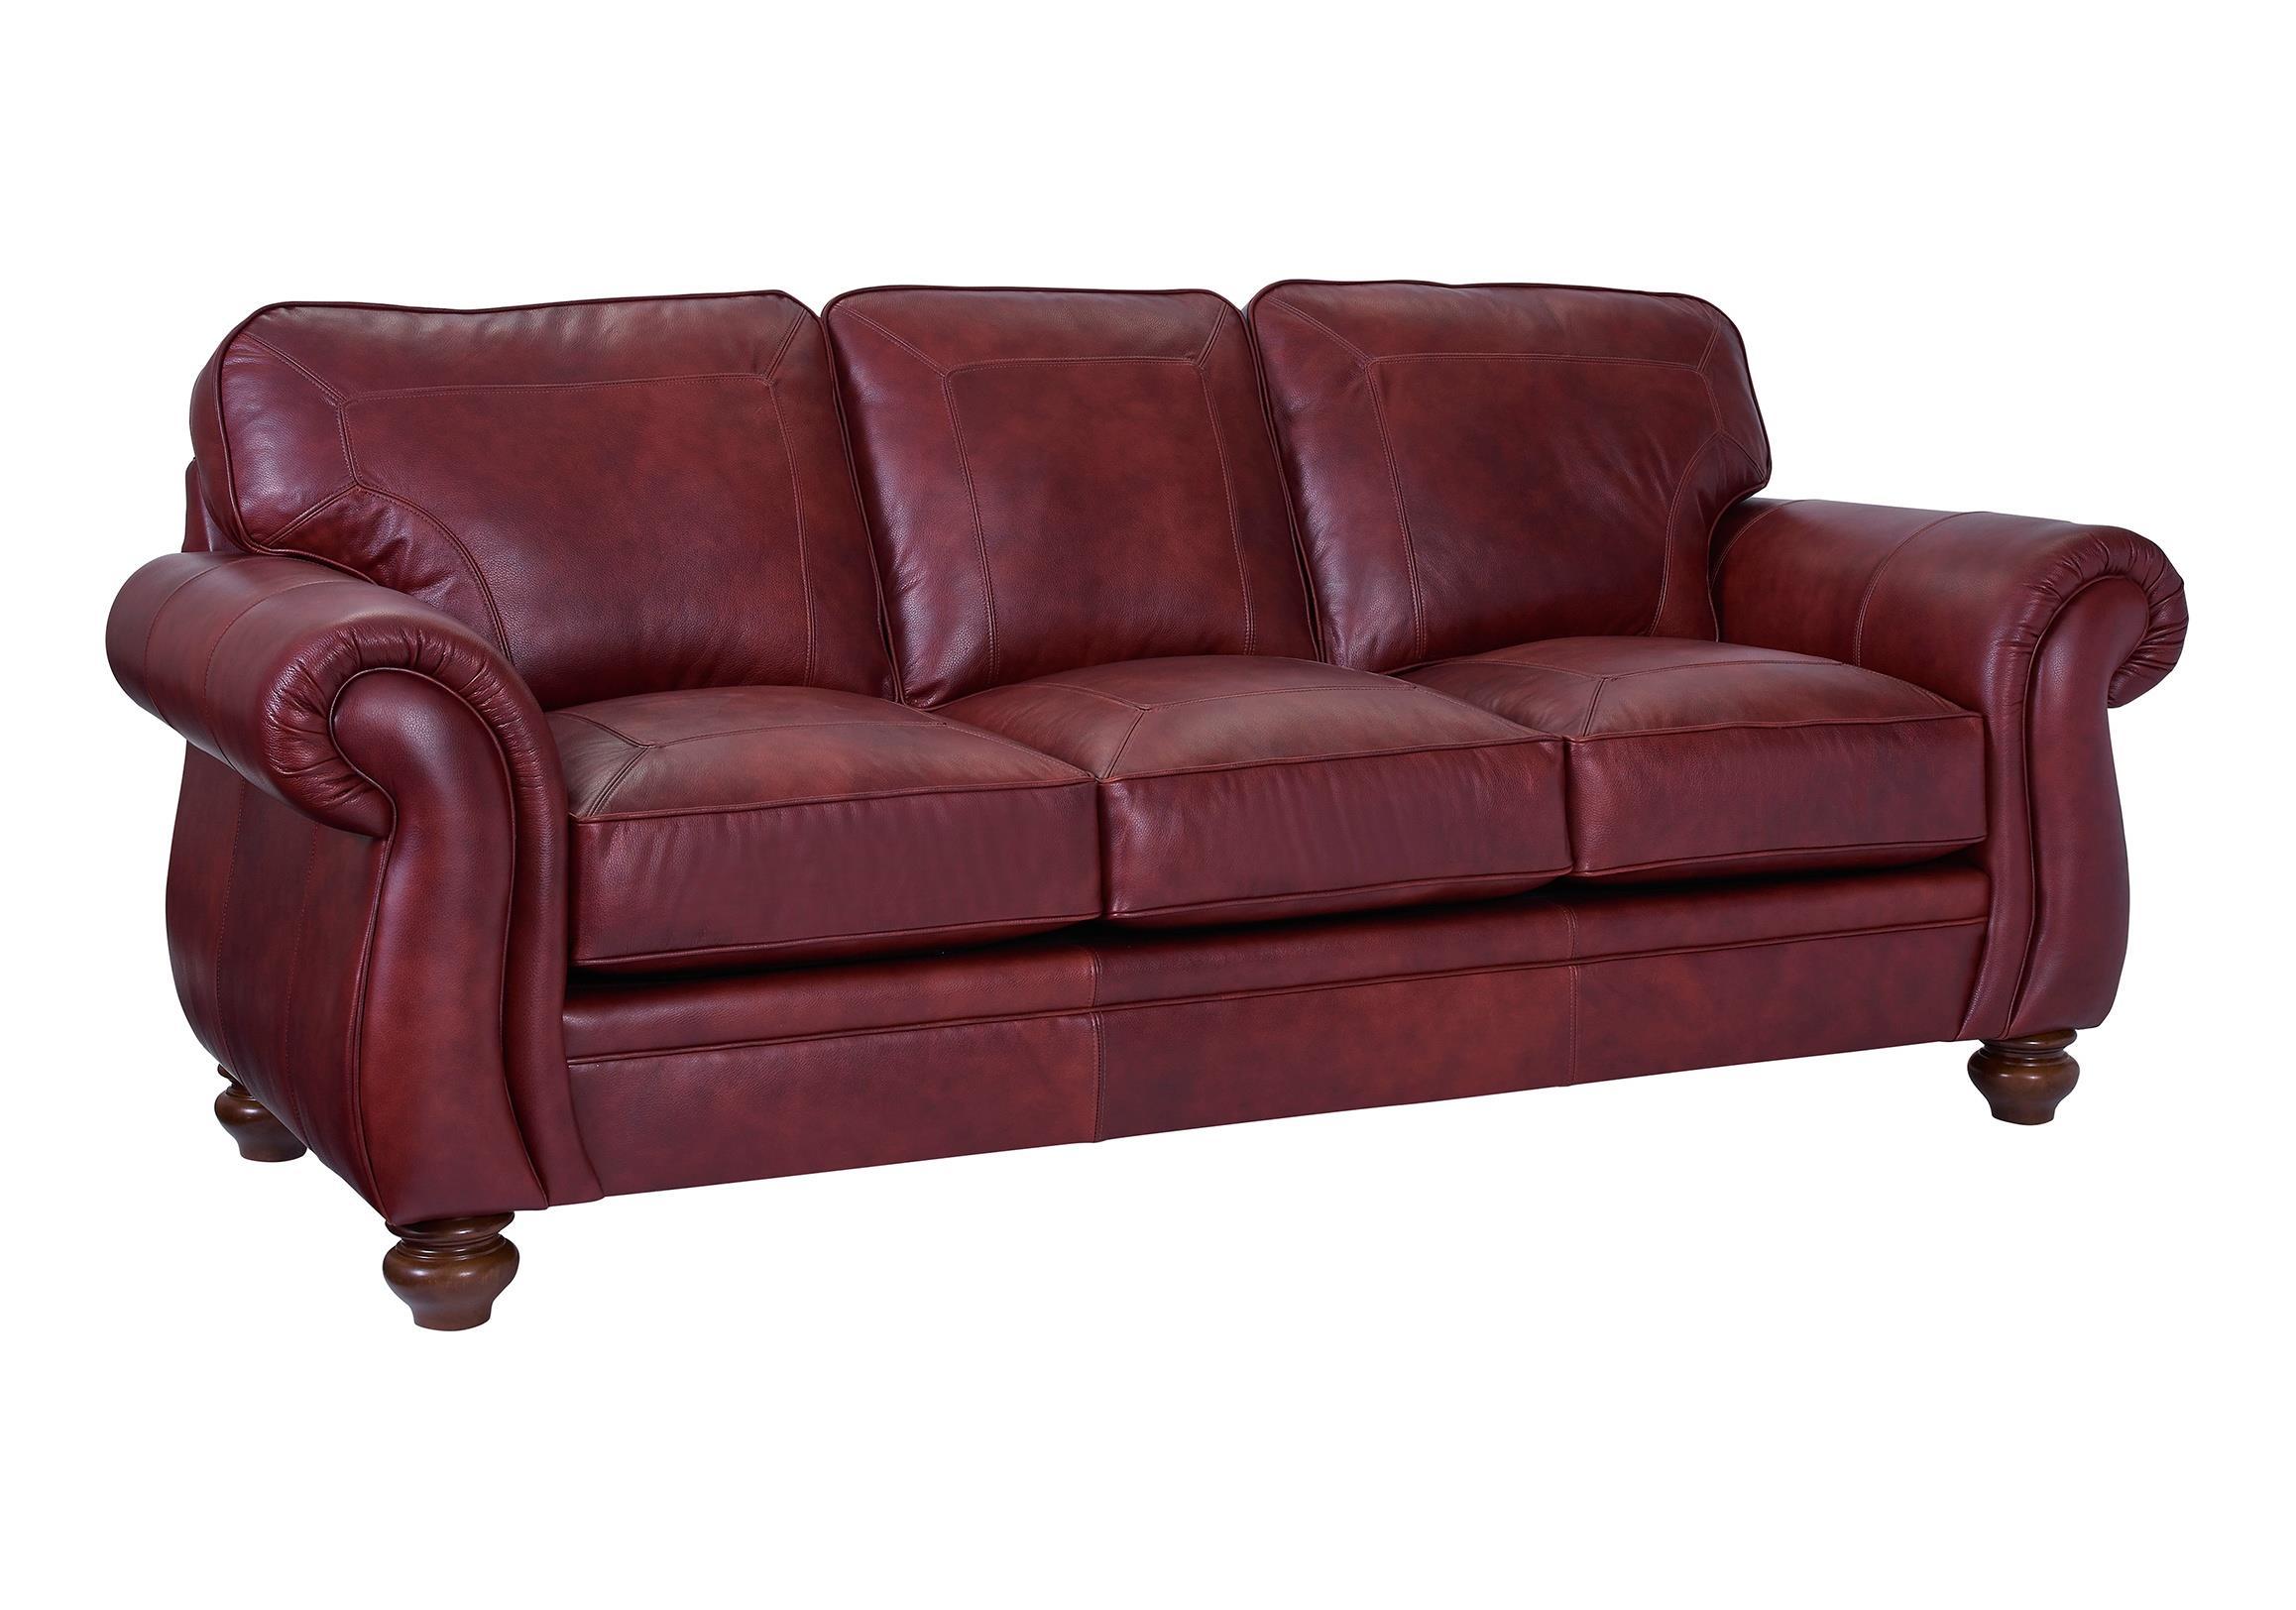 Broyhill Furniture Cassandra Traditional Stationary Sofa - Item Number: L3688-3-0063-69